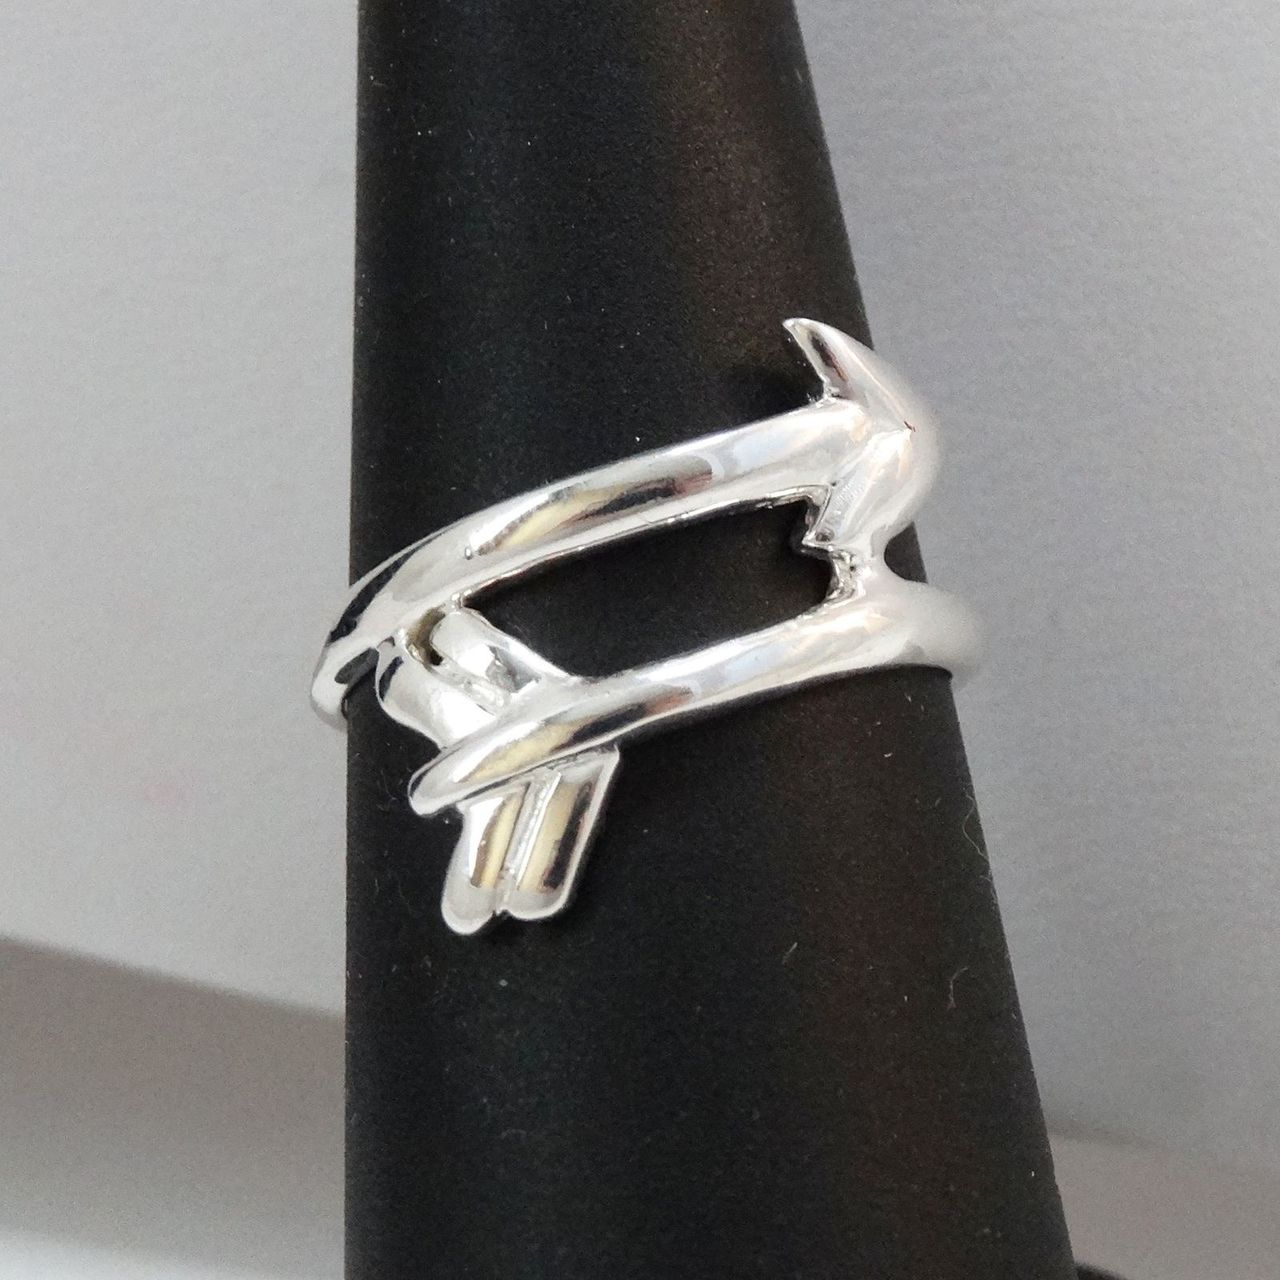 Arrow Ring - 925 Sterling Silver - Sideways Wrap Arrows Archery JEWELRY NEW